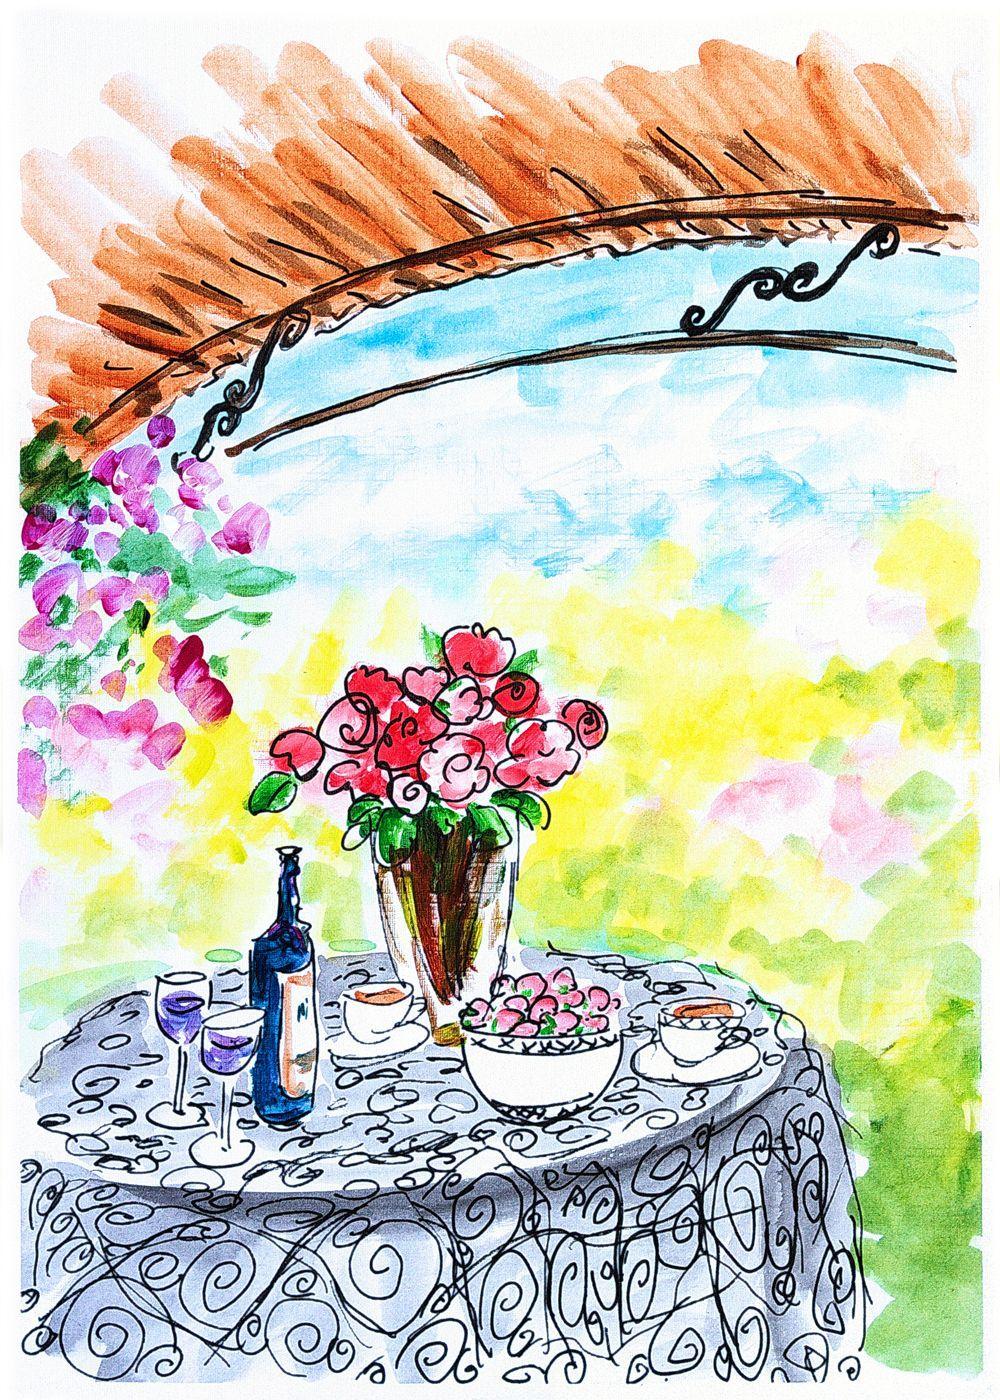 Wine in garden painting.Wine art.Garden painting.For wine lovers.Summer art.Flowers art.Wall art wine.Home decor.Wedding gift.Couple gifts#art #artflowers #artgarden #artwall #decorwedding #flowers #garden #giftcouple #gifts #lovers #loverssummer #painting #paintingfor #paintingwine #summer #wine #winehome